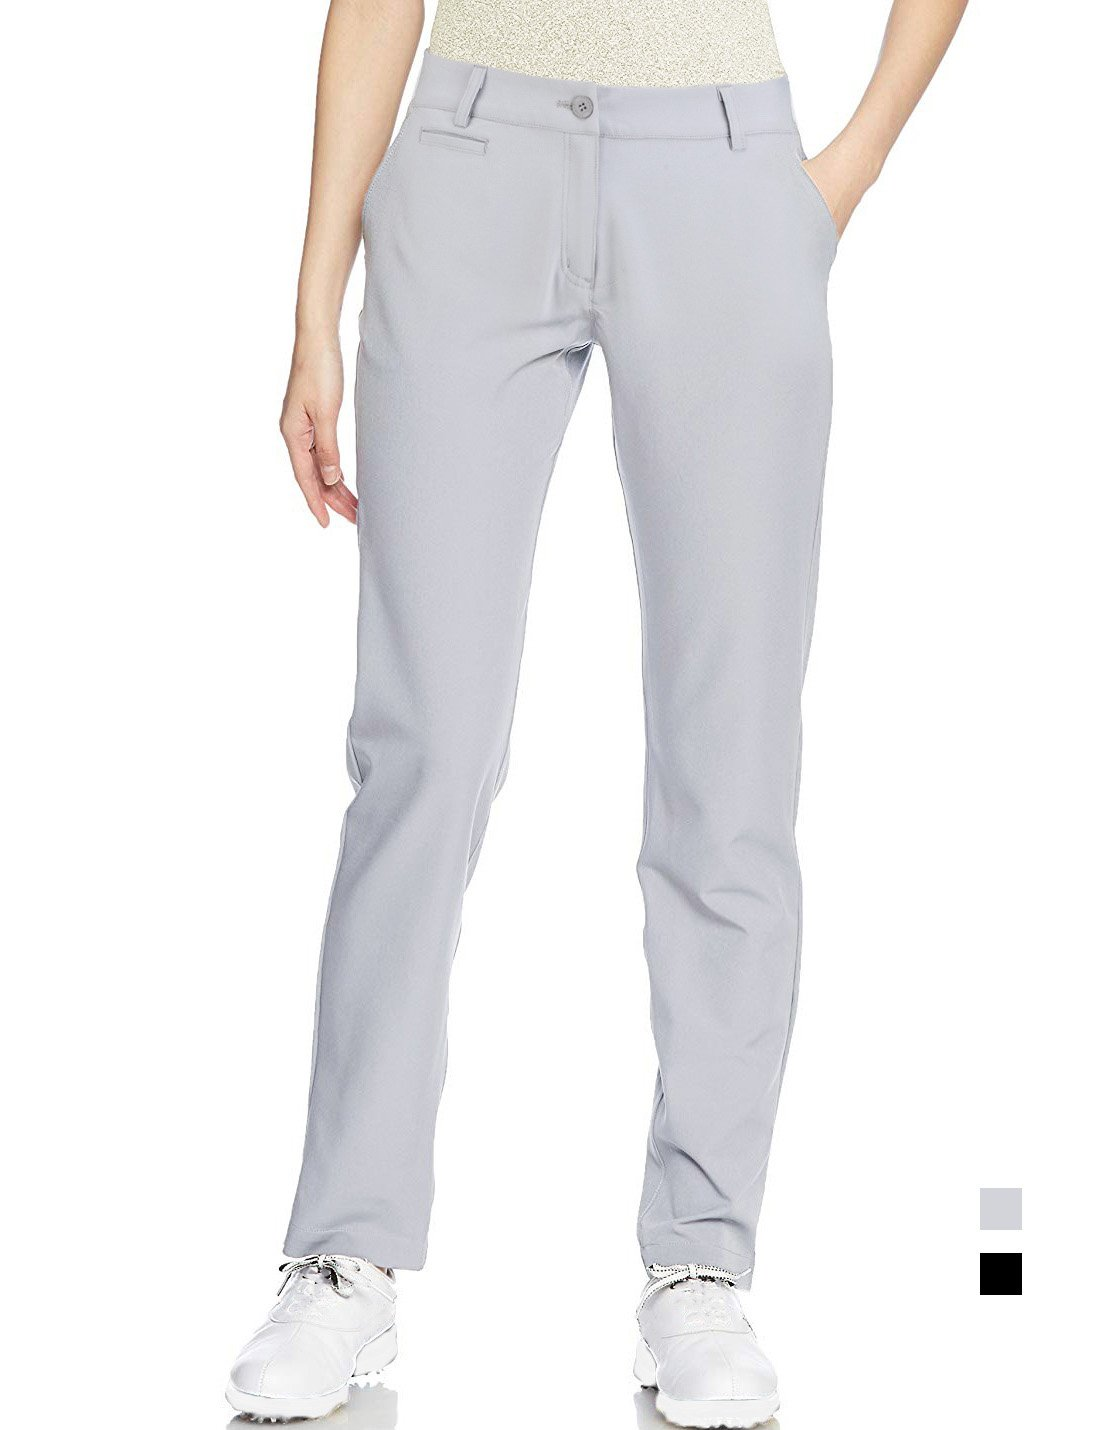 Golf Pants Women Long Stretch Tall Straight Leg Twill Work Chino Ladies Size 4 Grey